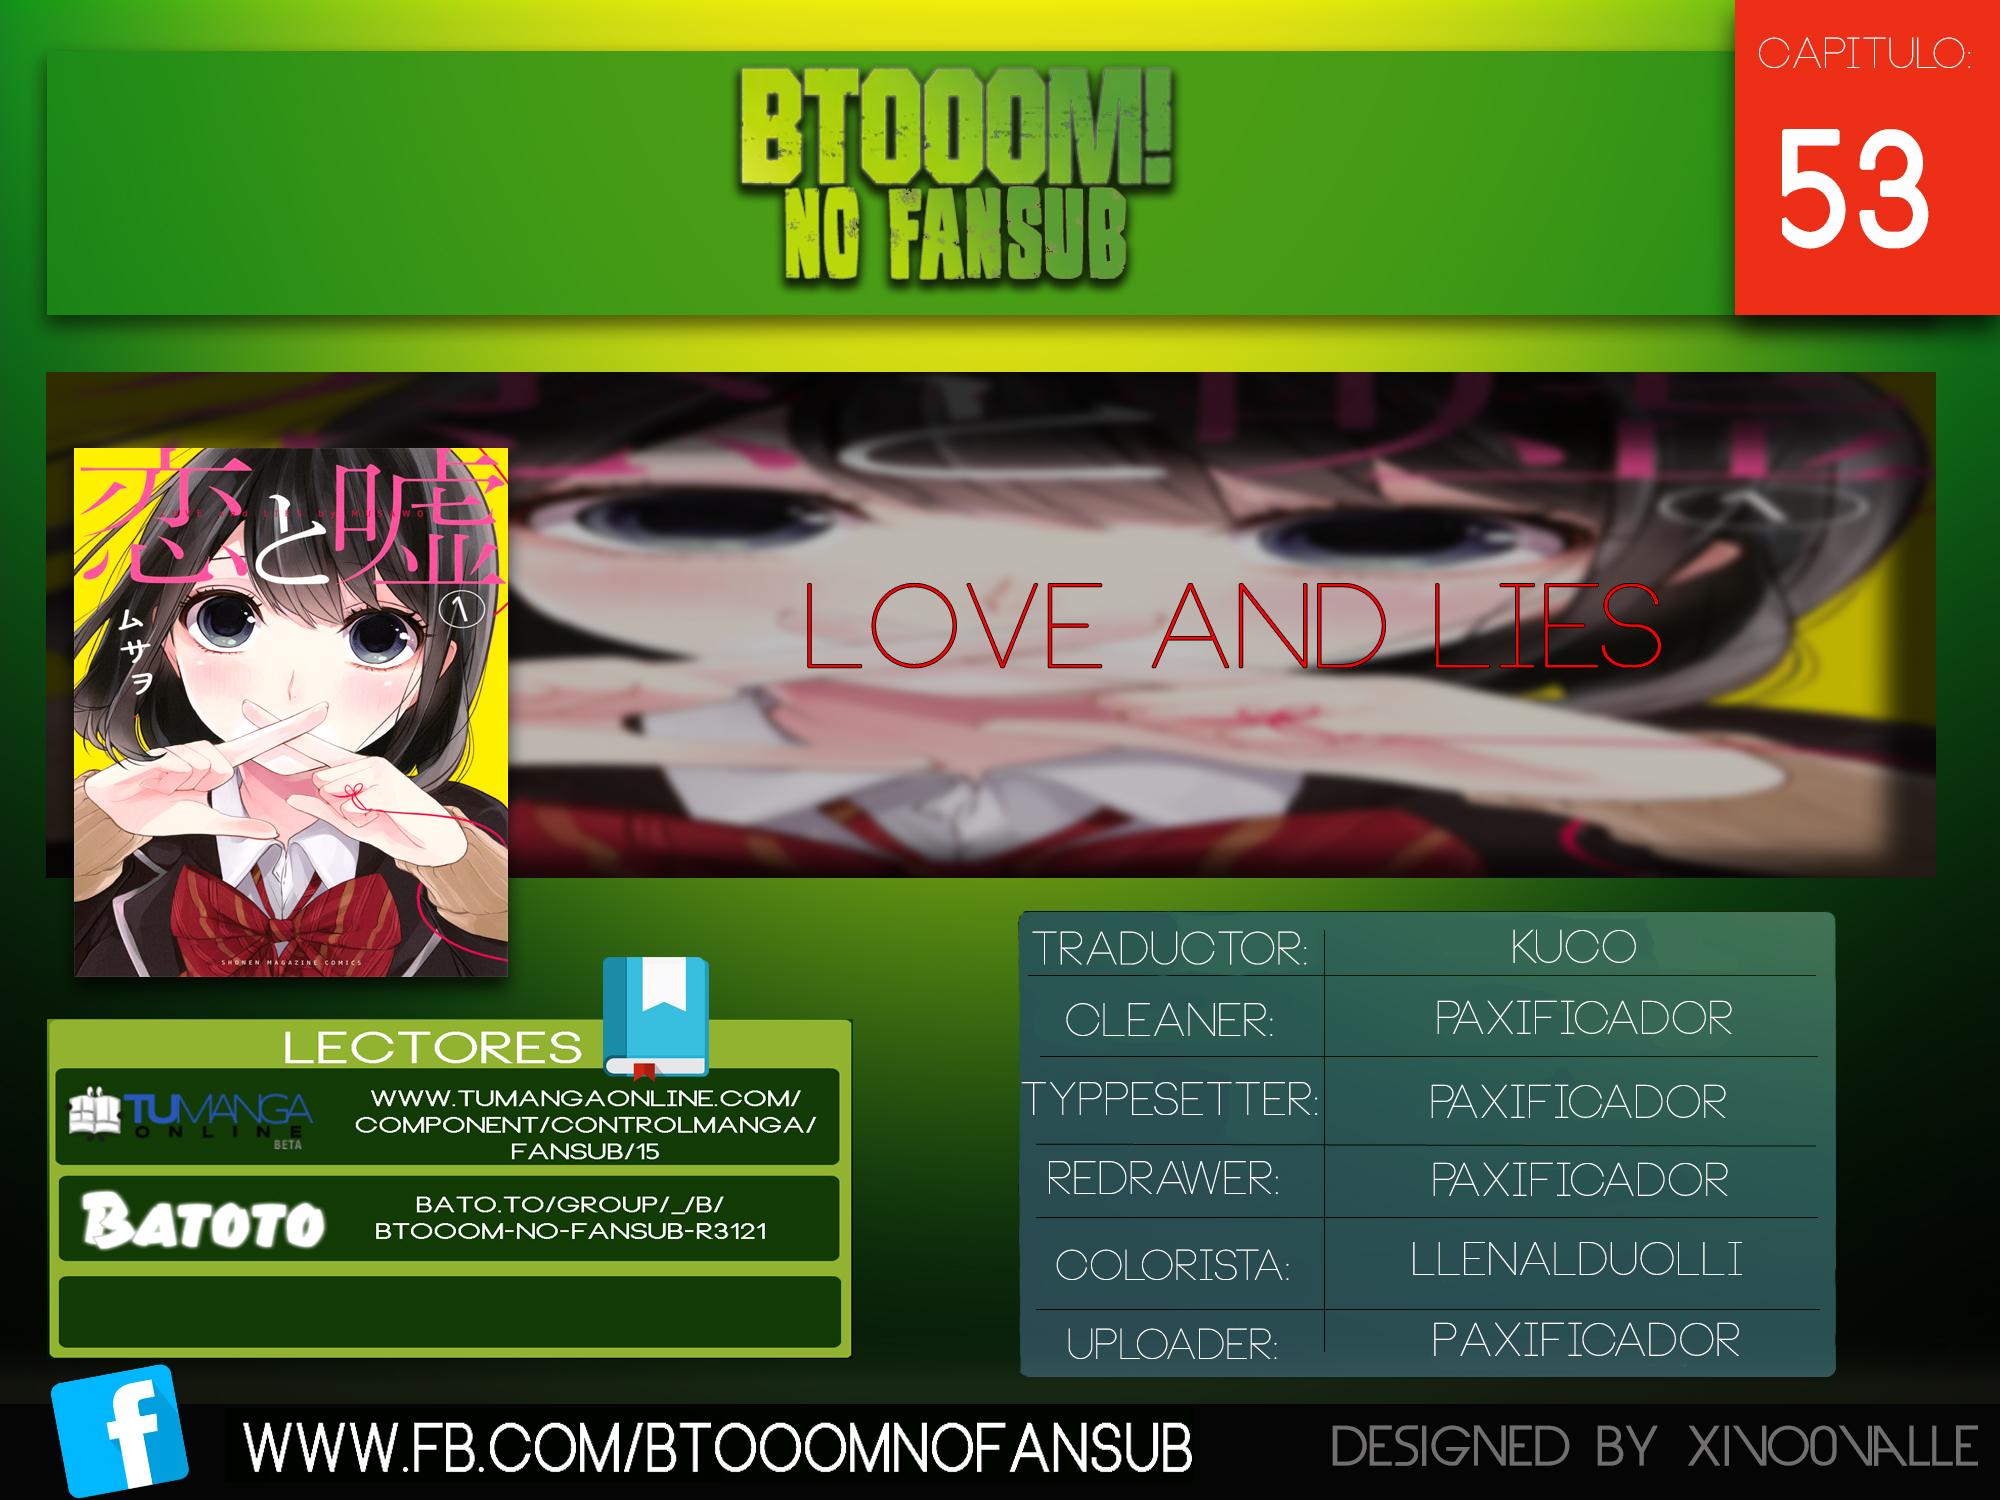 http://c5.ninemanga.com/es_manga/14/14734/416149/6ad2e2b2ea01af0b391c7b912c844dba.jpg Page 1